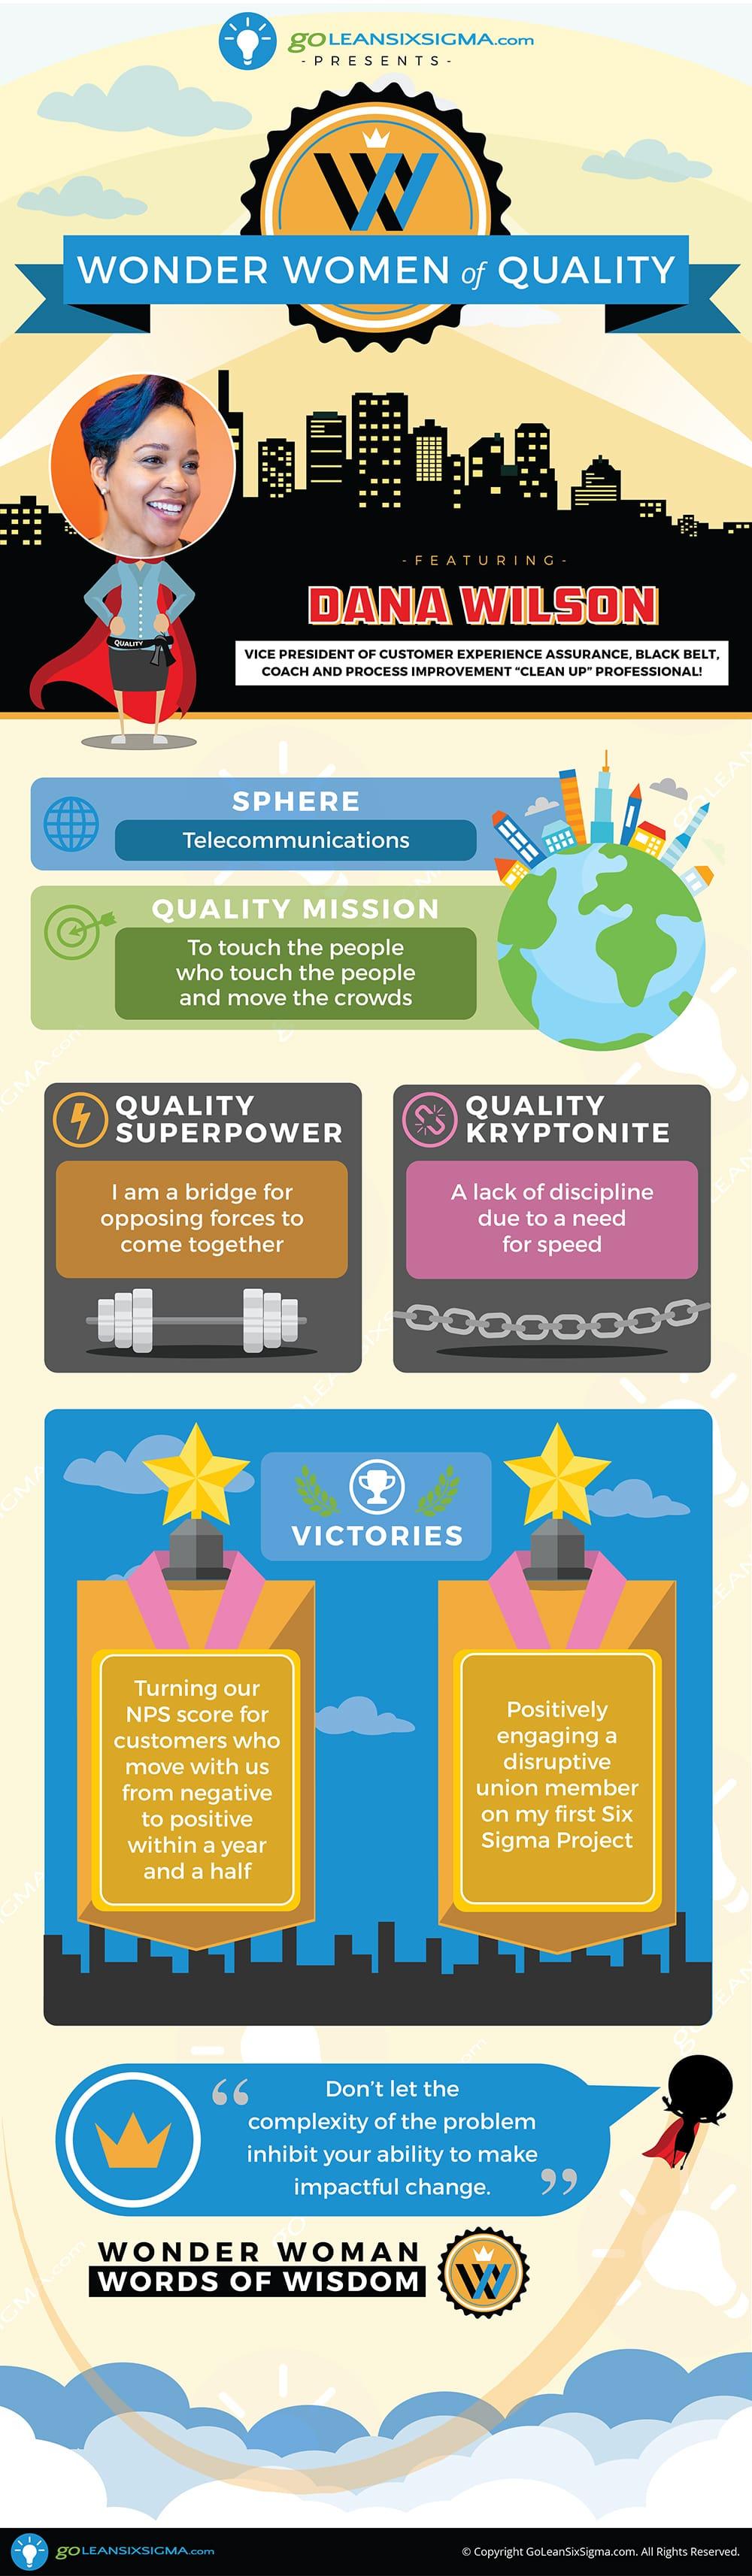 Wonder Women of Quality: Dana Wilson - GoLeanSixSigma.com